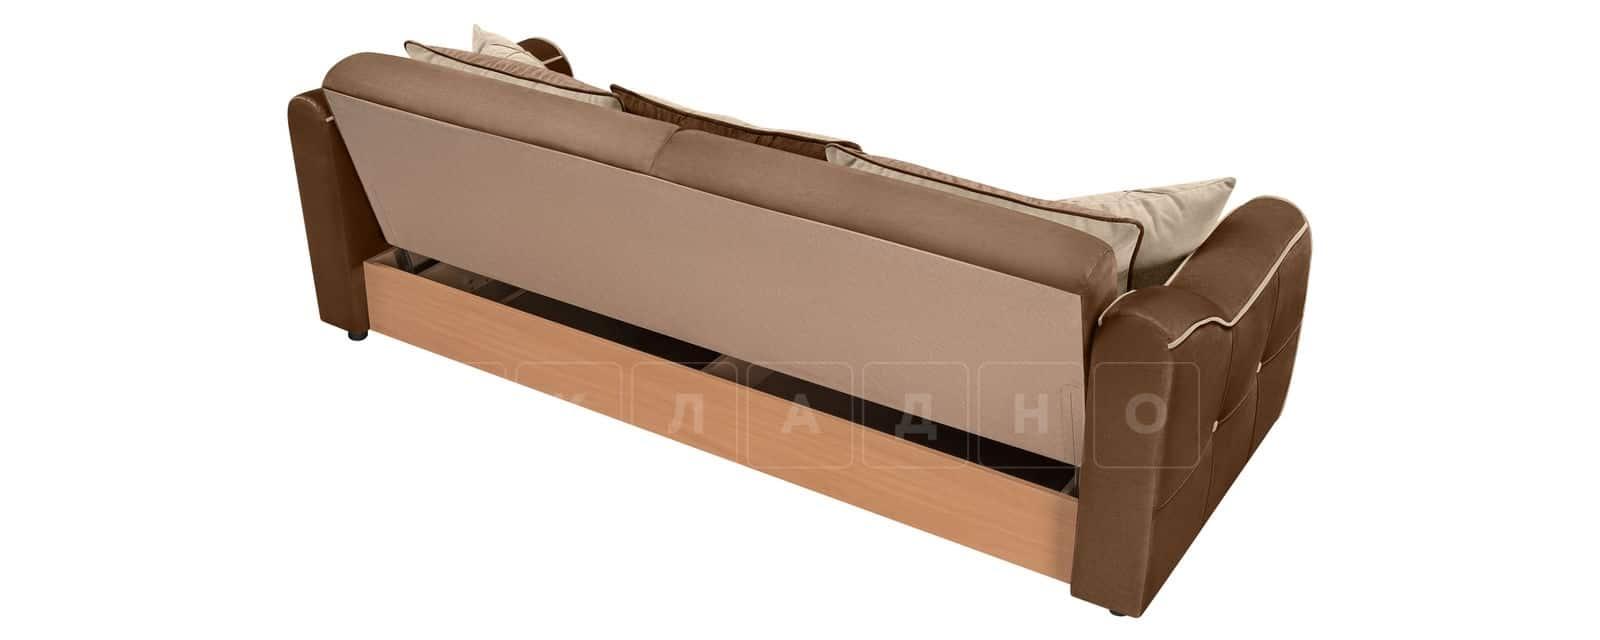 Диван Флэтфорд велюр коричневый фото 3 | интернет-магазин Складно